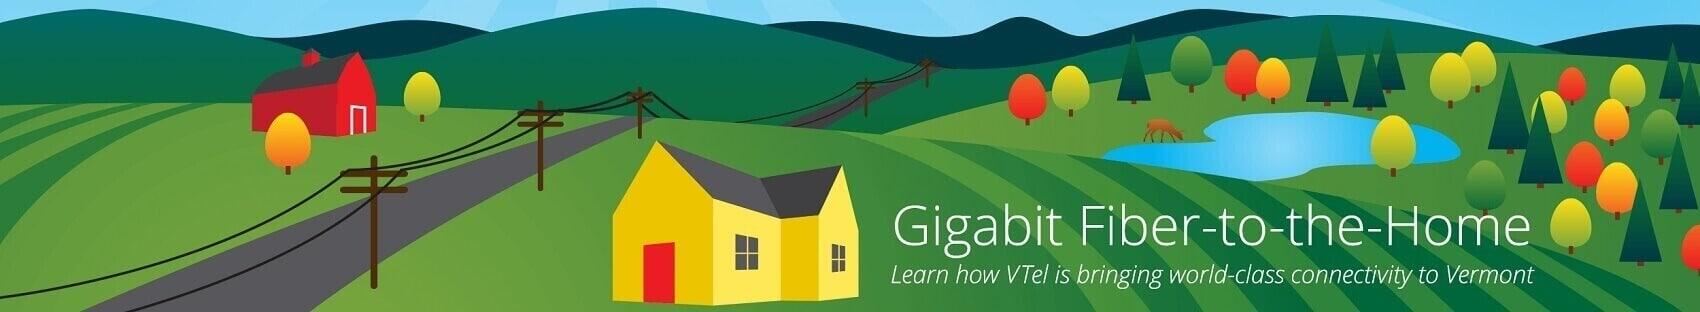 slideshow-gigabit-fiber-to-the-home